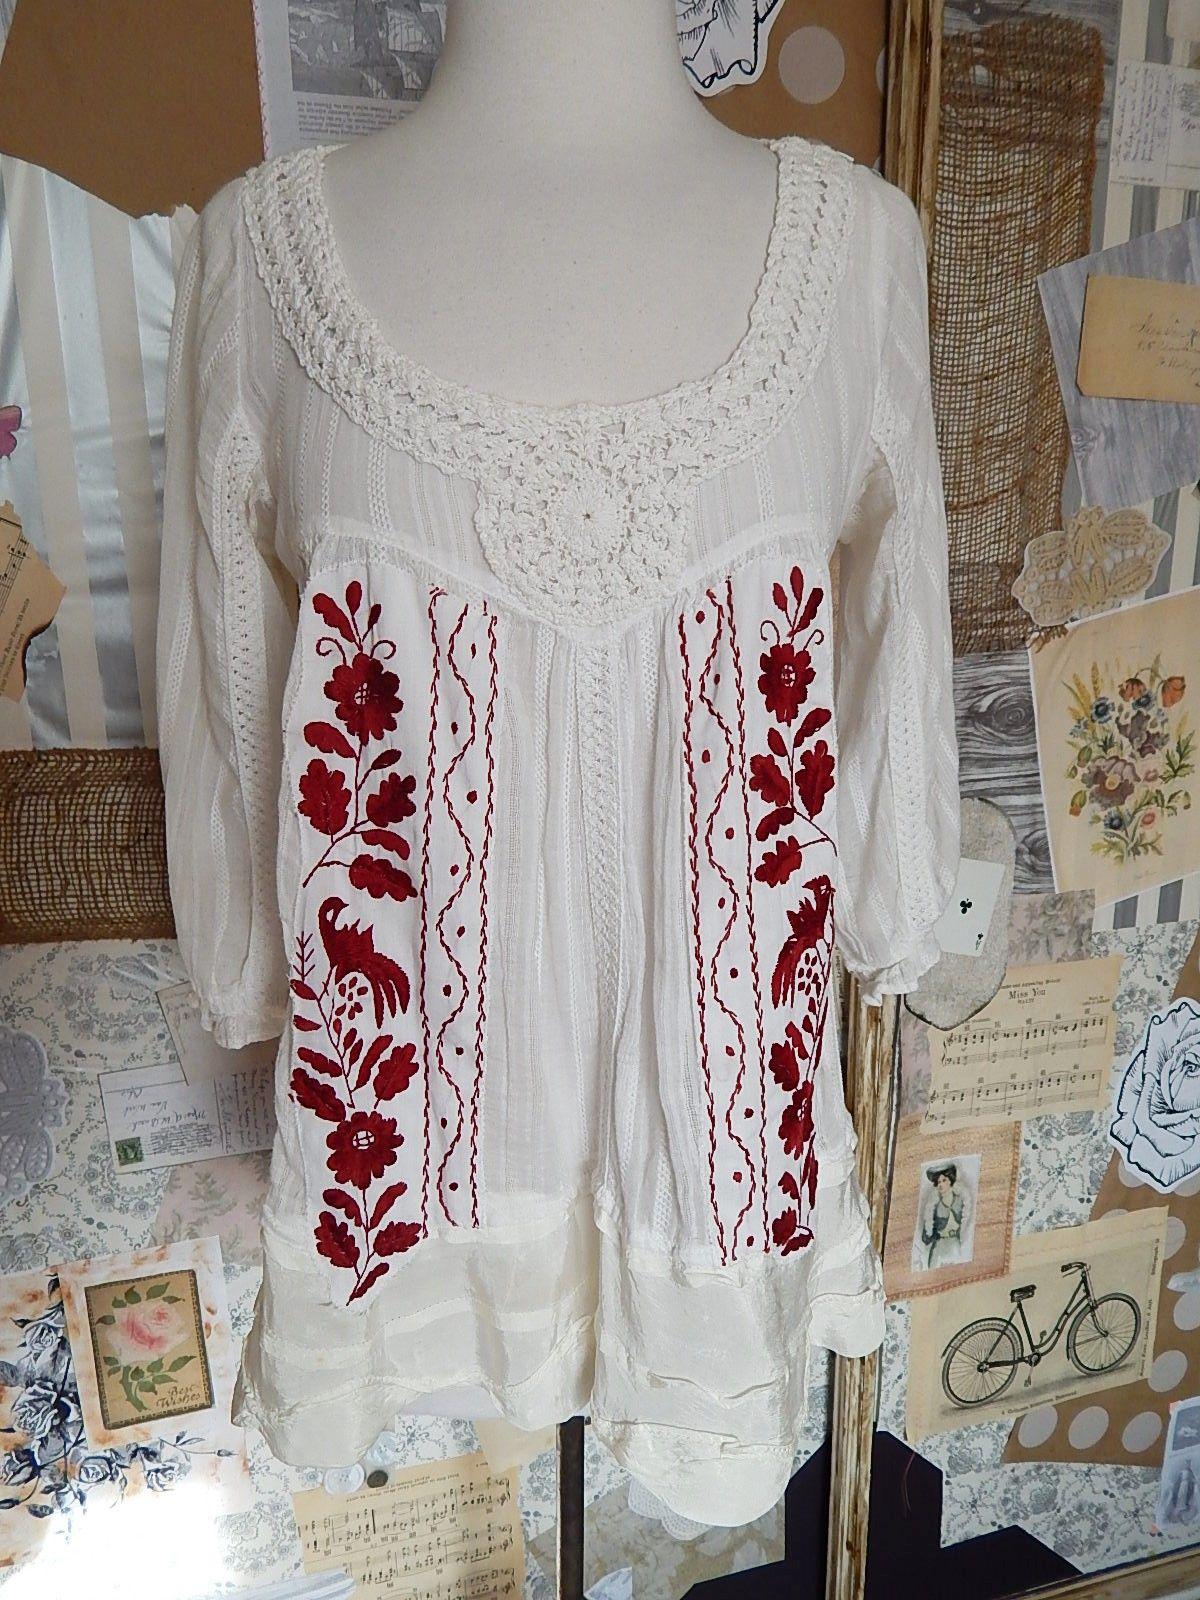 d3b52539f24 Lavender vintage crochet Mexican blouse gauze by AidaCoronado, $98.00    ETSY Shoppe   Mexican blouse, Vintage crochet, Blouse